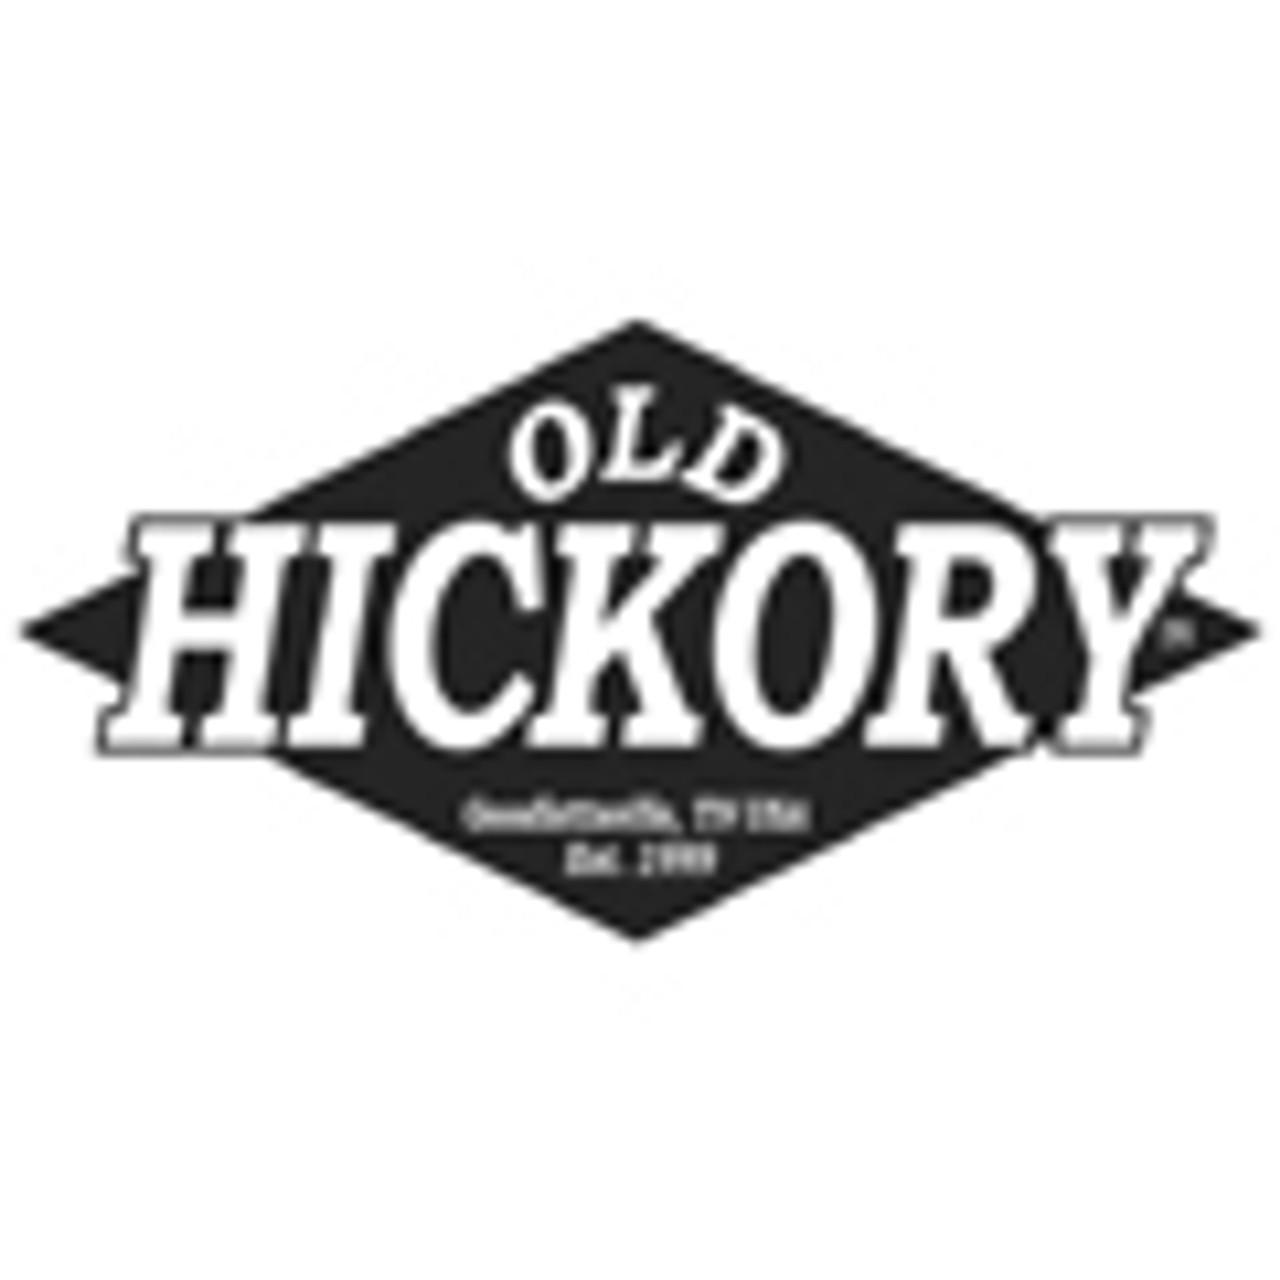 Old Hickory Pro Baseball Gloves